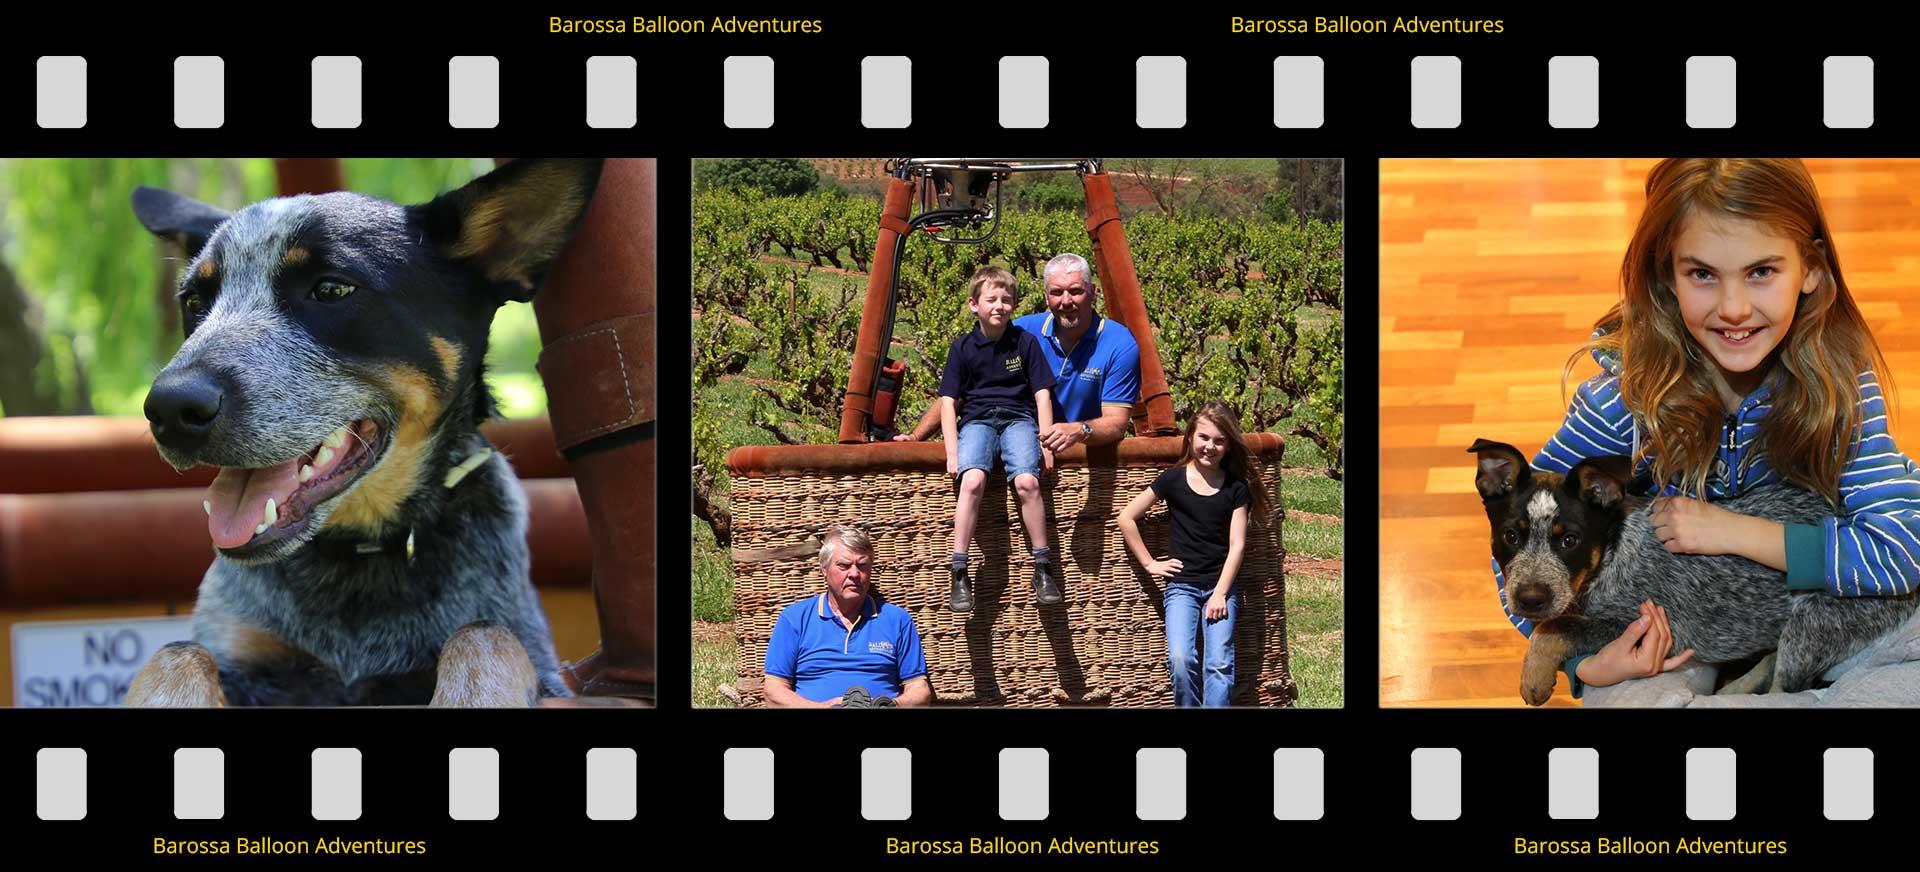 gibson family image strip post Balloon Adventures Barossa flight